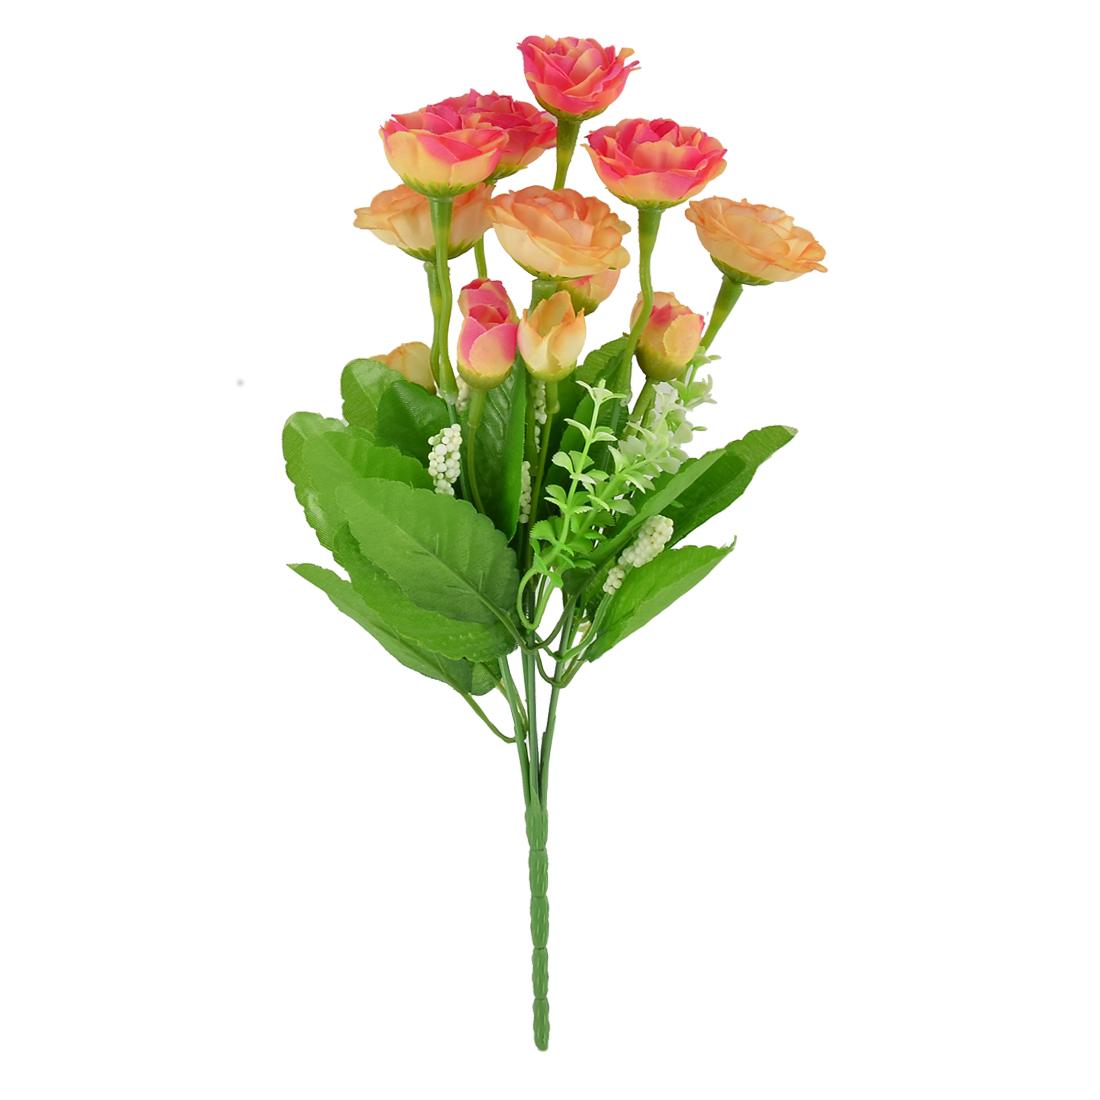 Home Wedding Party Decor Rose Buds Artificial Flower Bouquet Orange Red